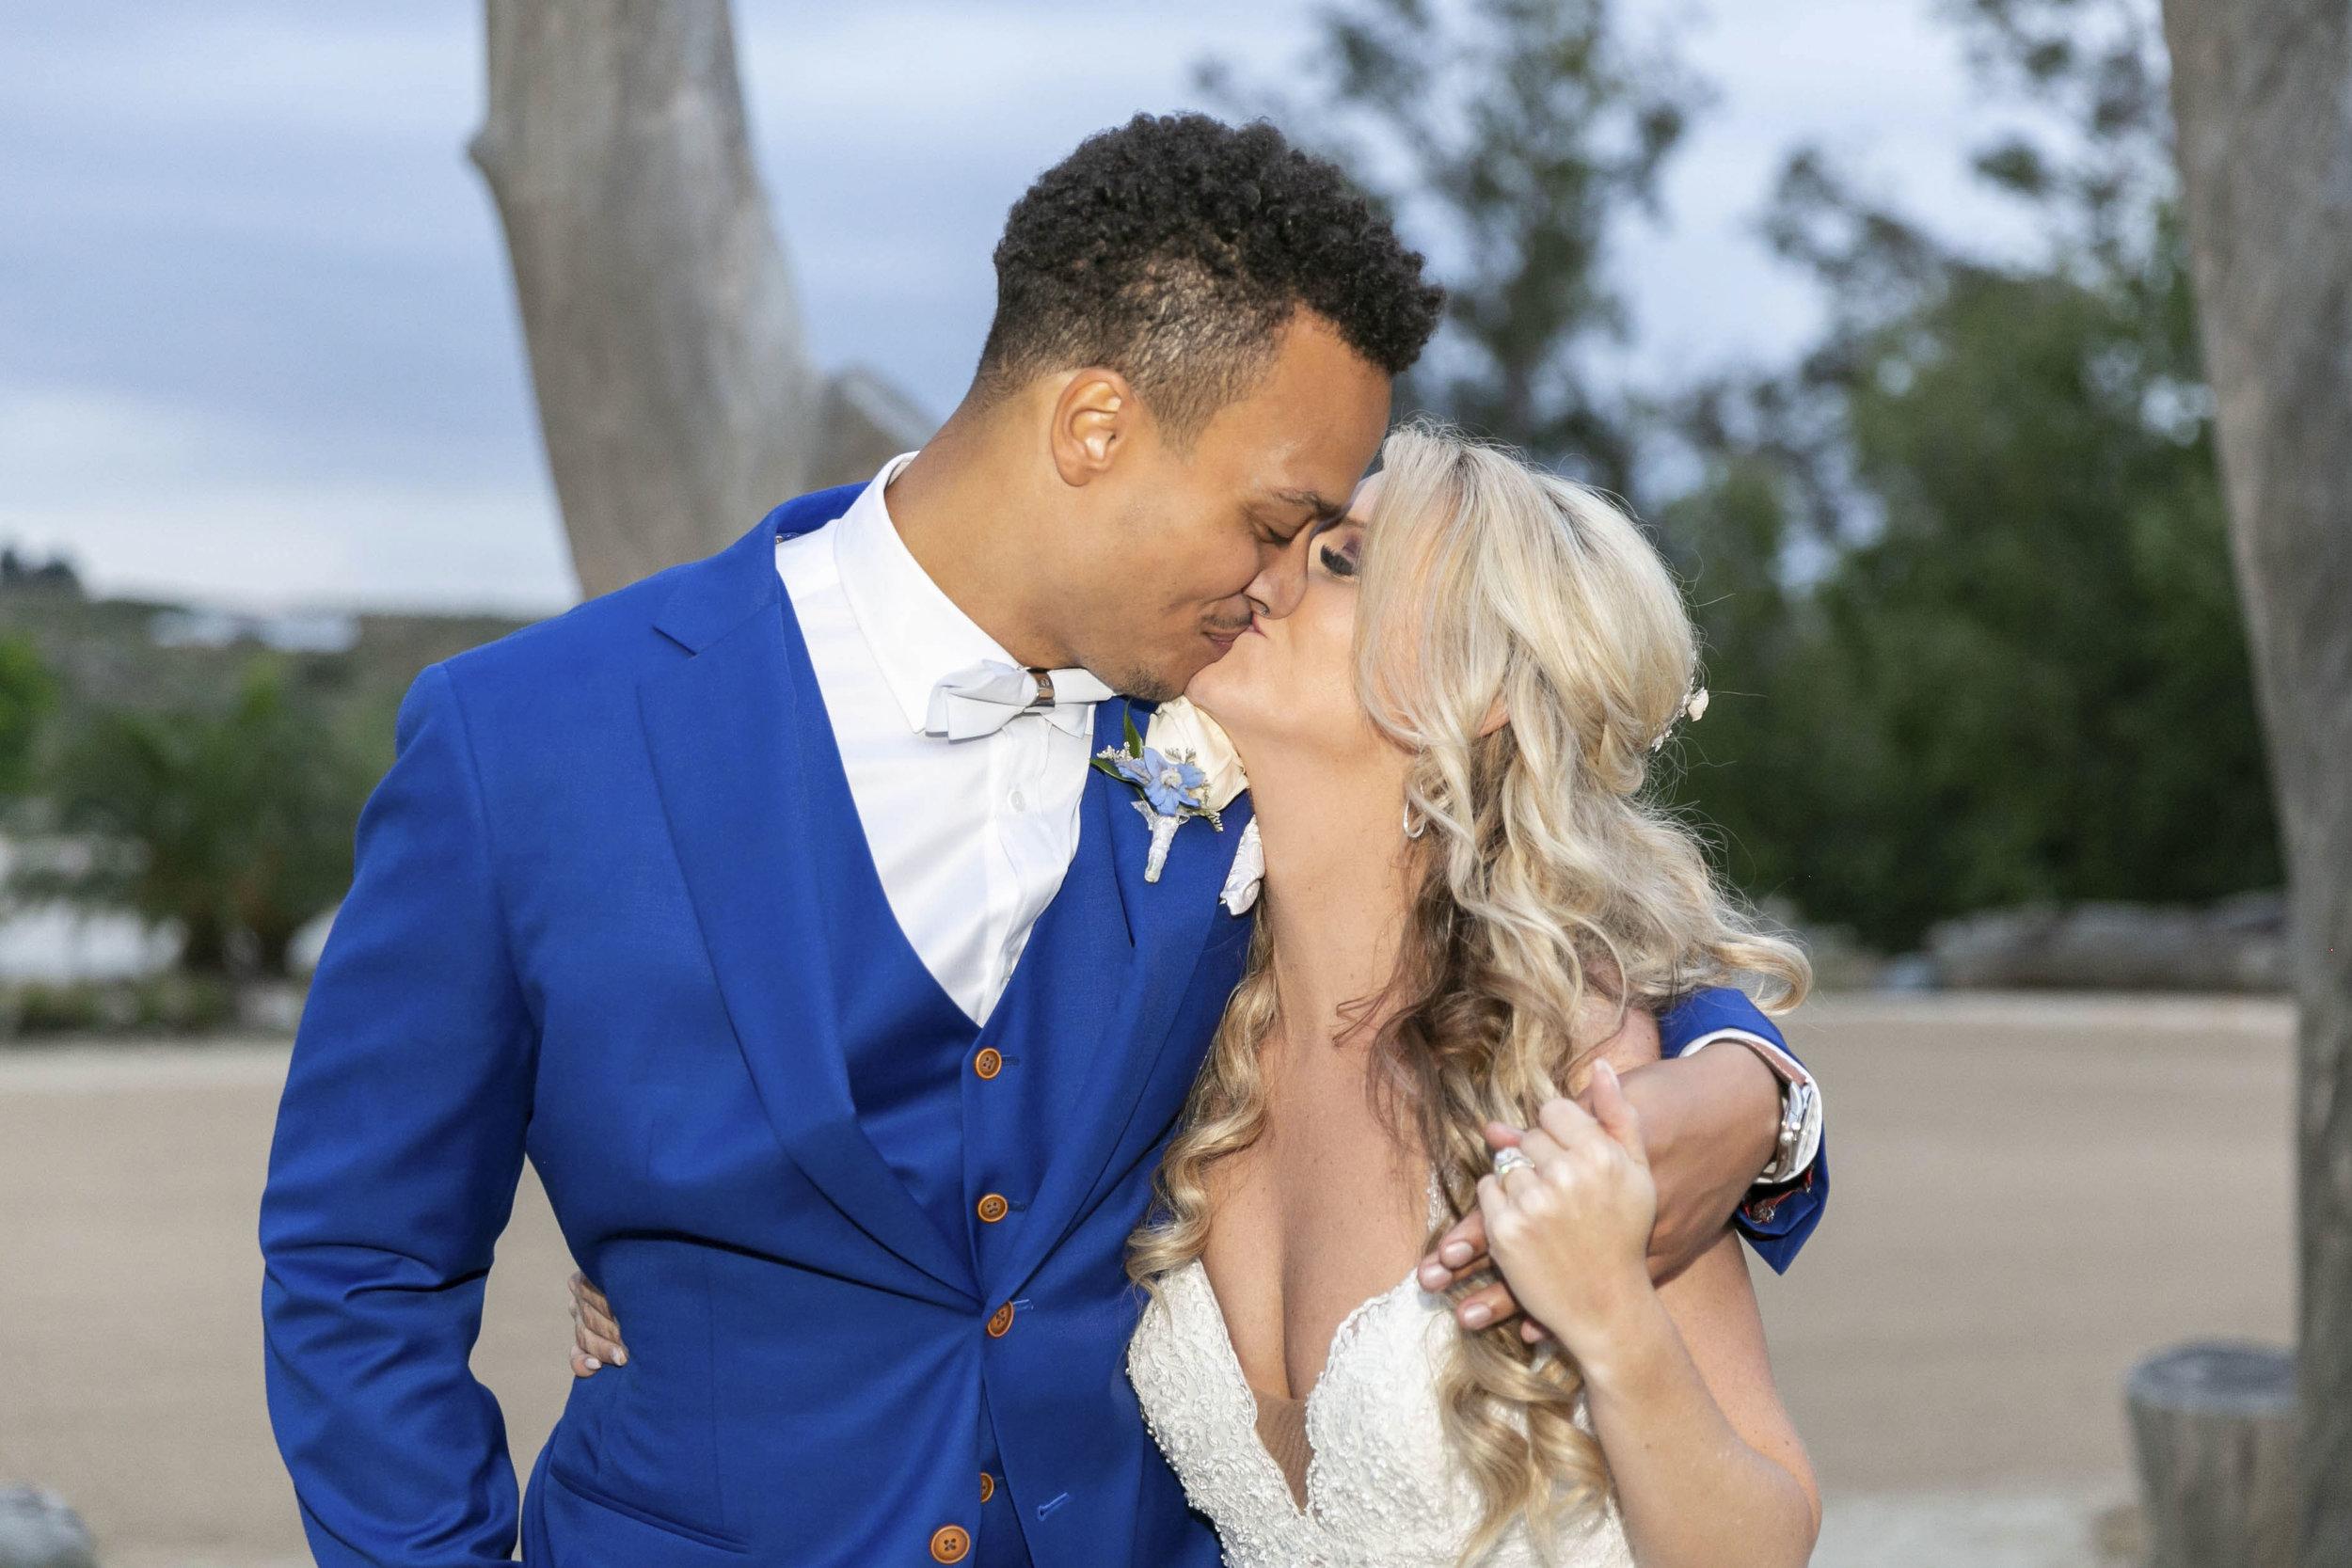 Domenica Beauty _ Hair and Makeup Artist _Wedding _ Temecula, CA Wedding _ Briana and Samuel _ 37.JPG